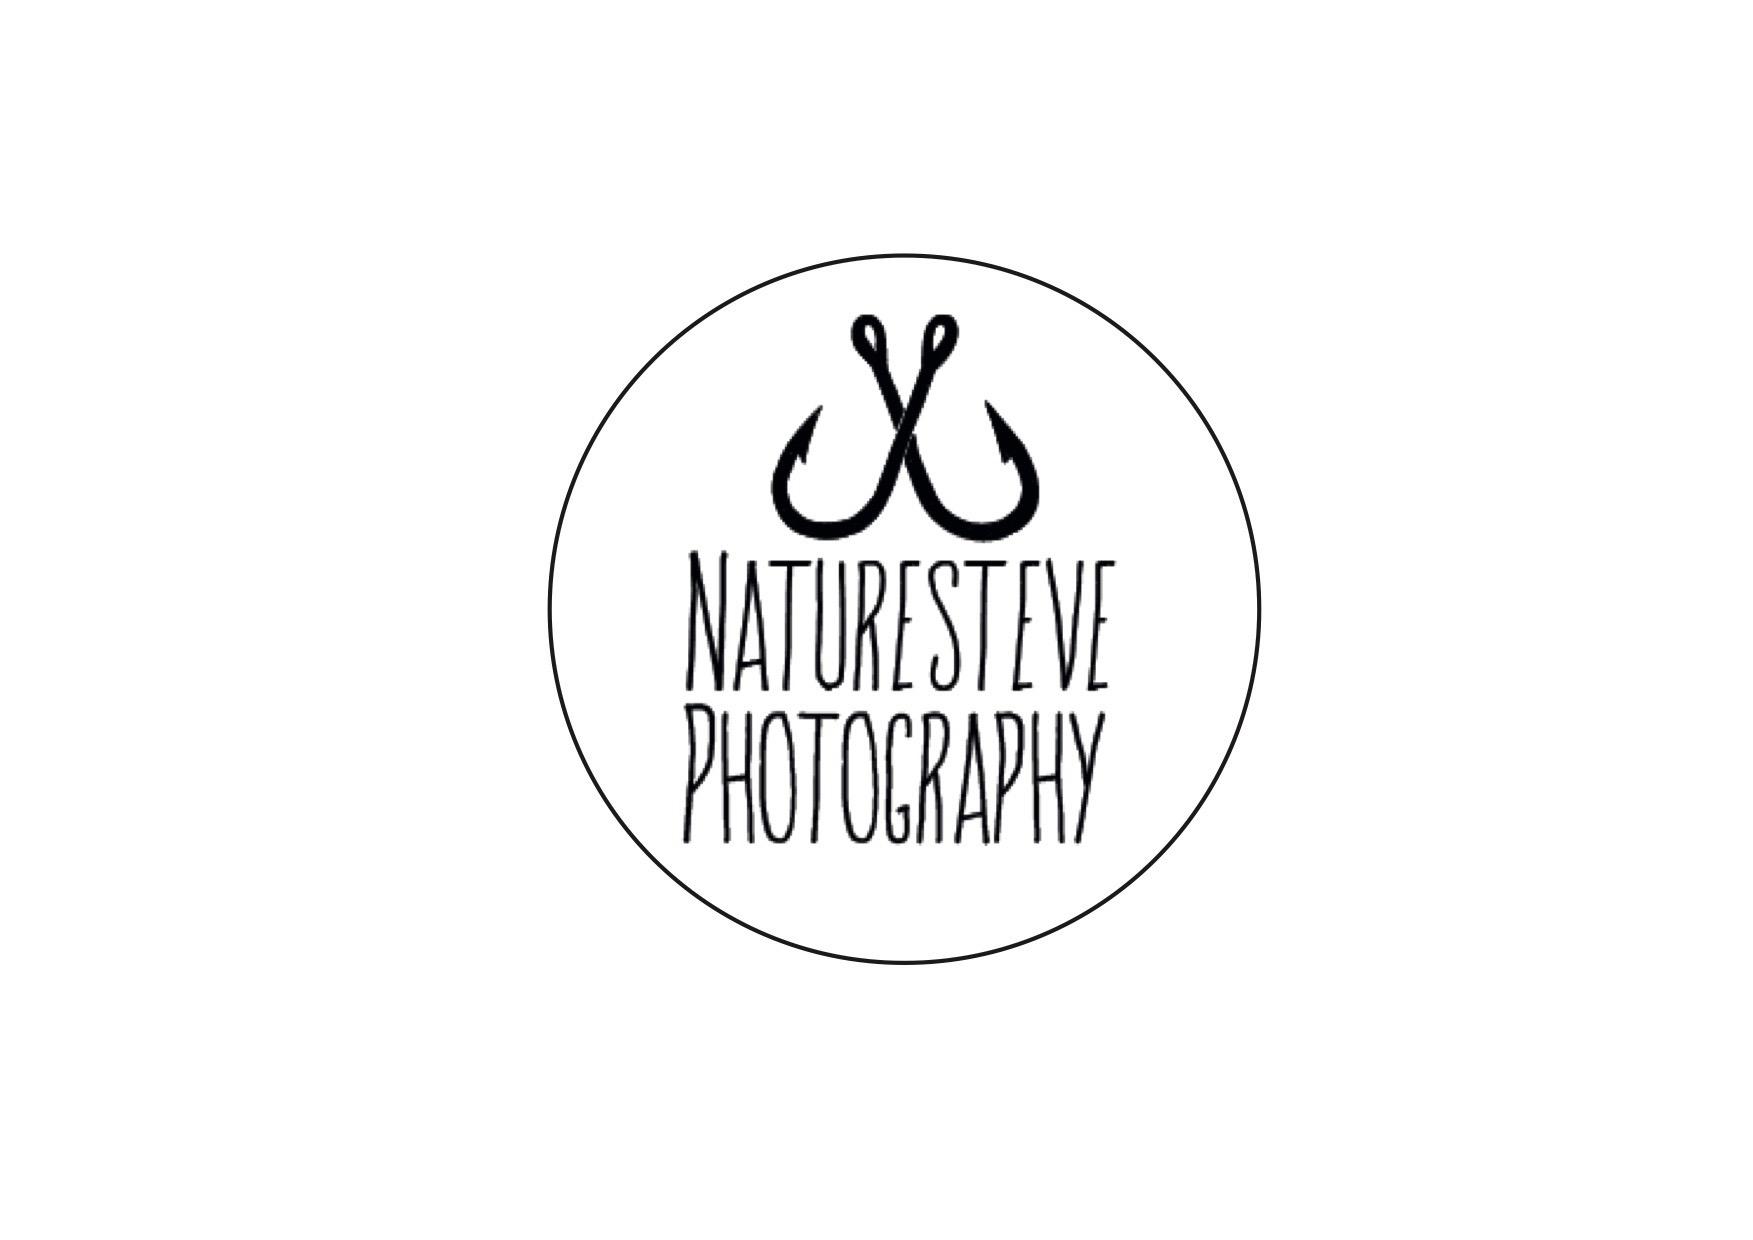 Naturesteve